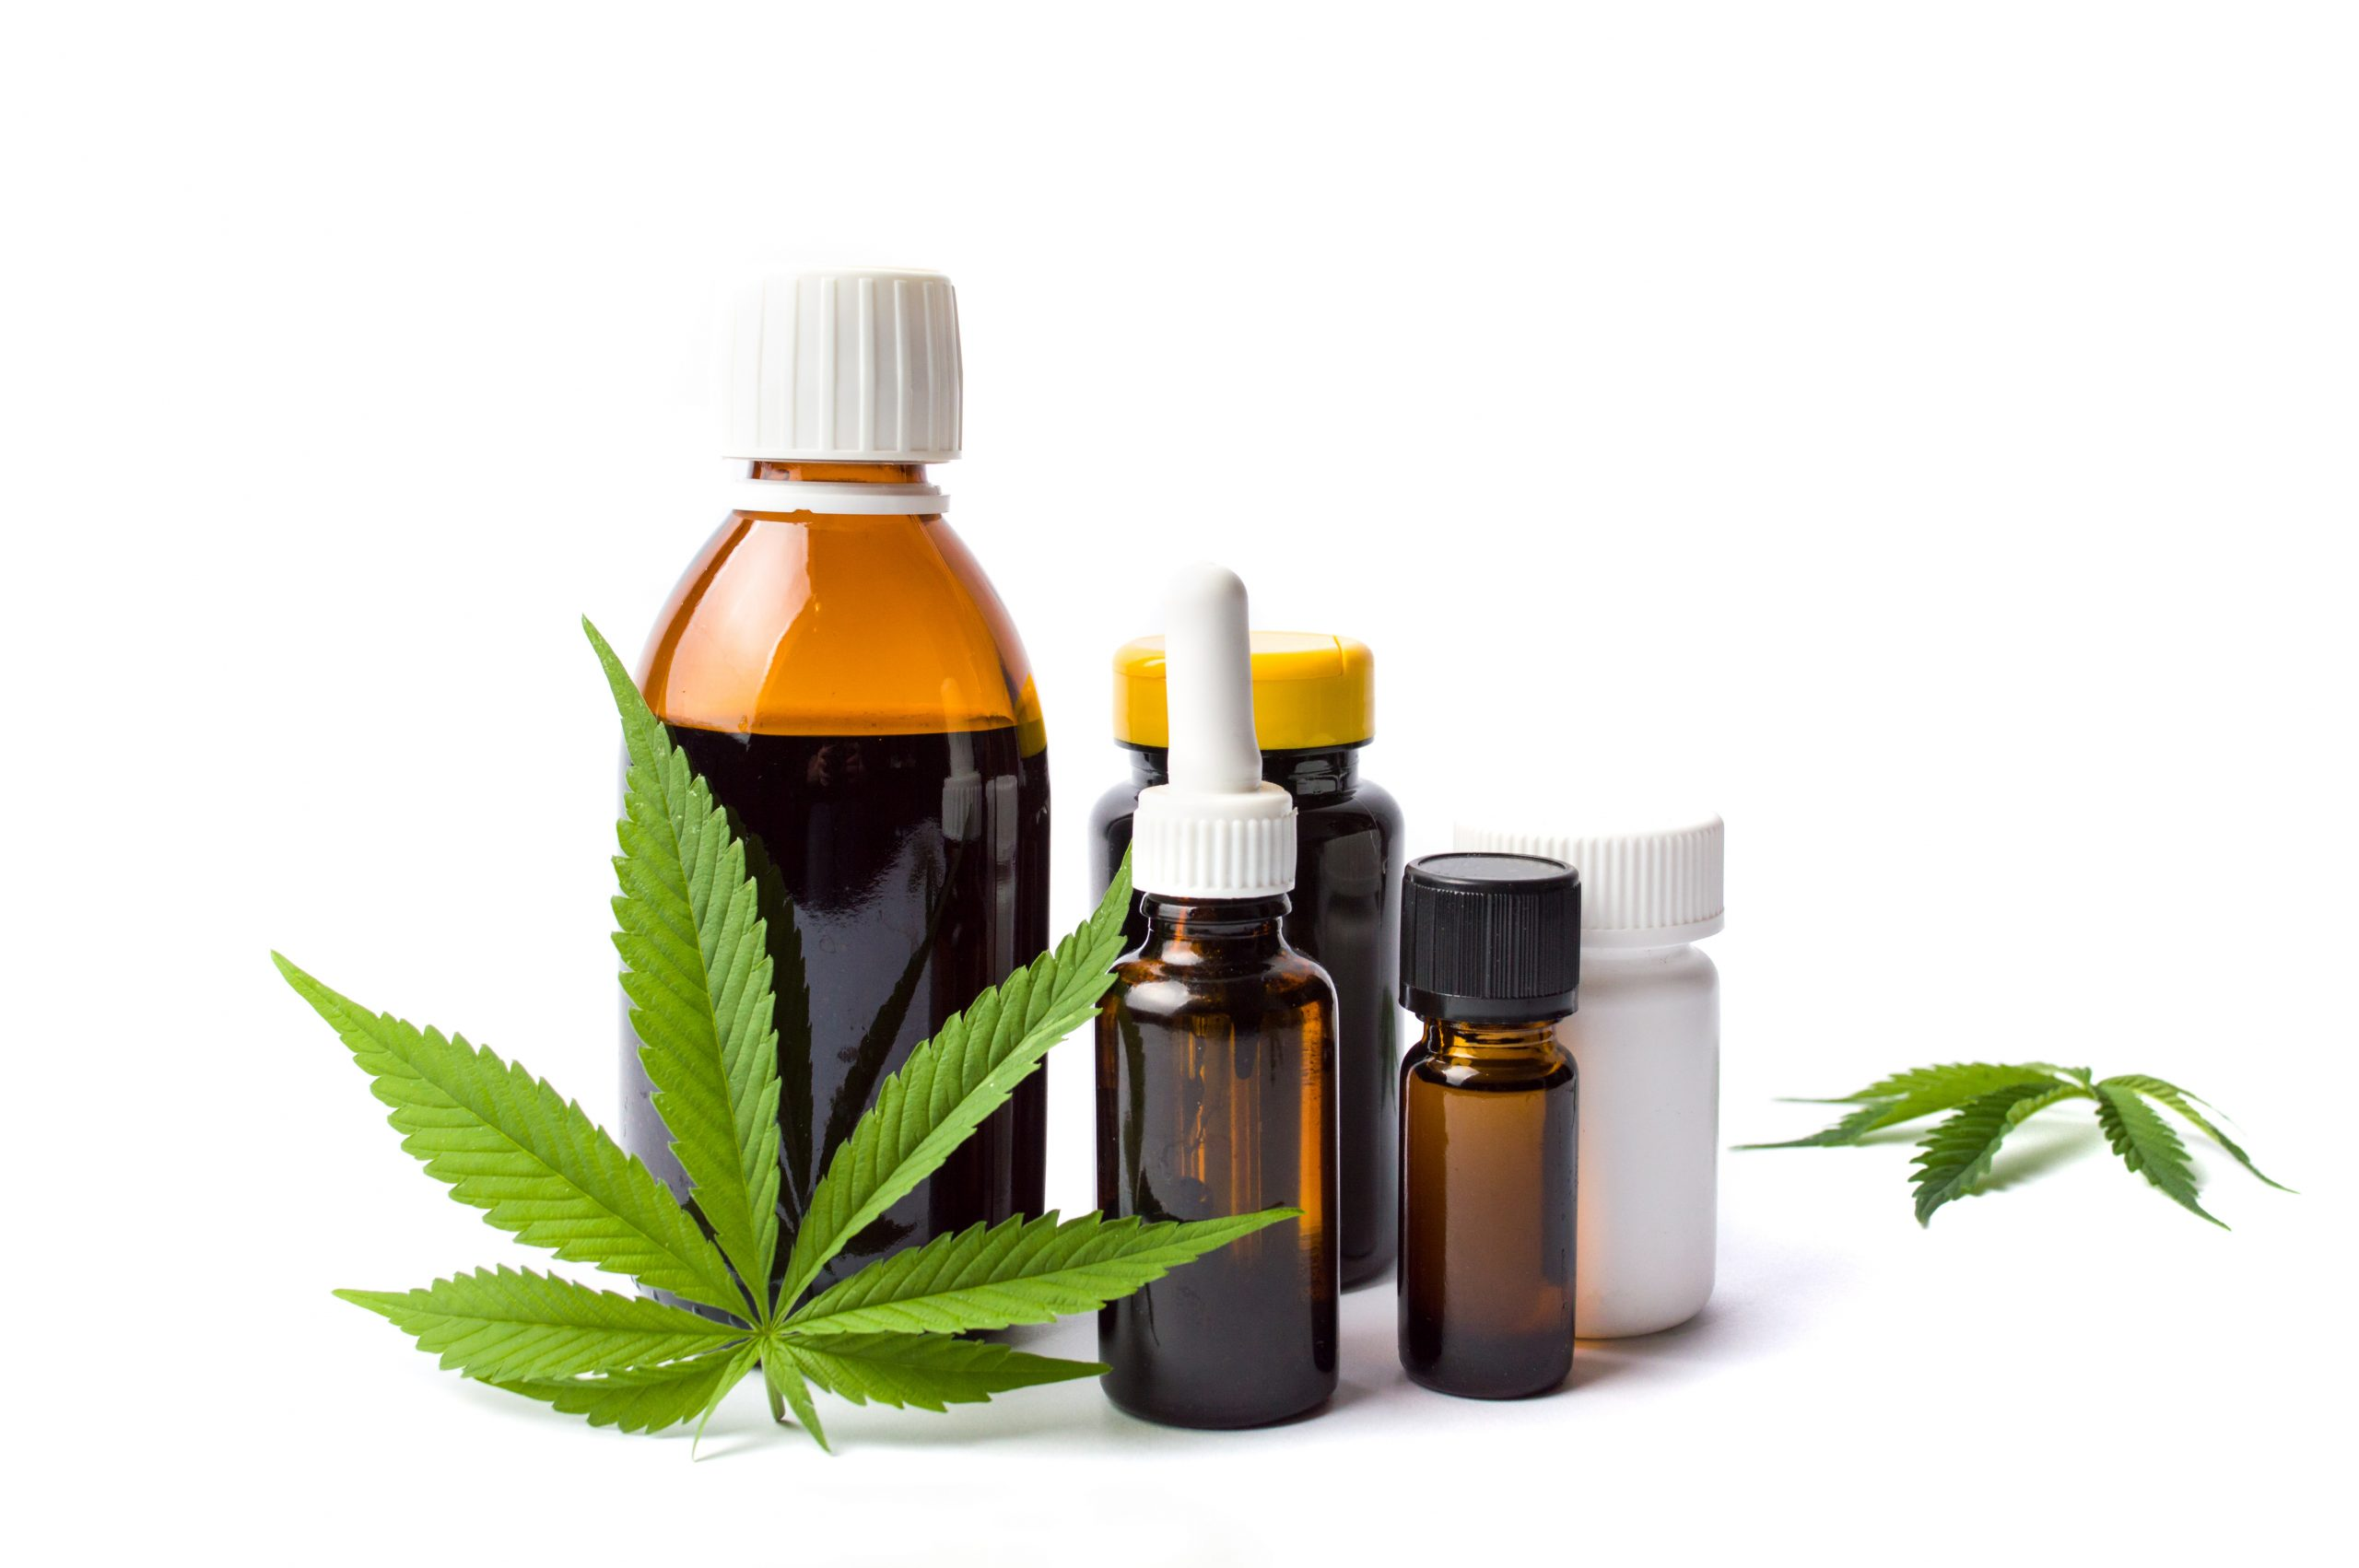 A green cannabis leaf is stood against a brown medicine bottle